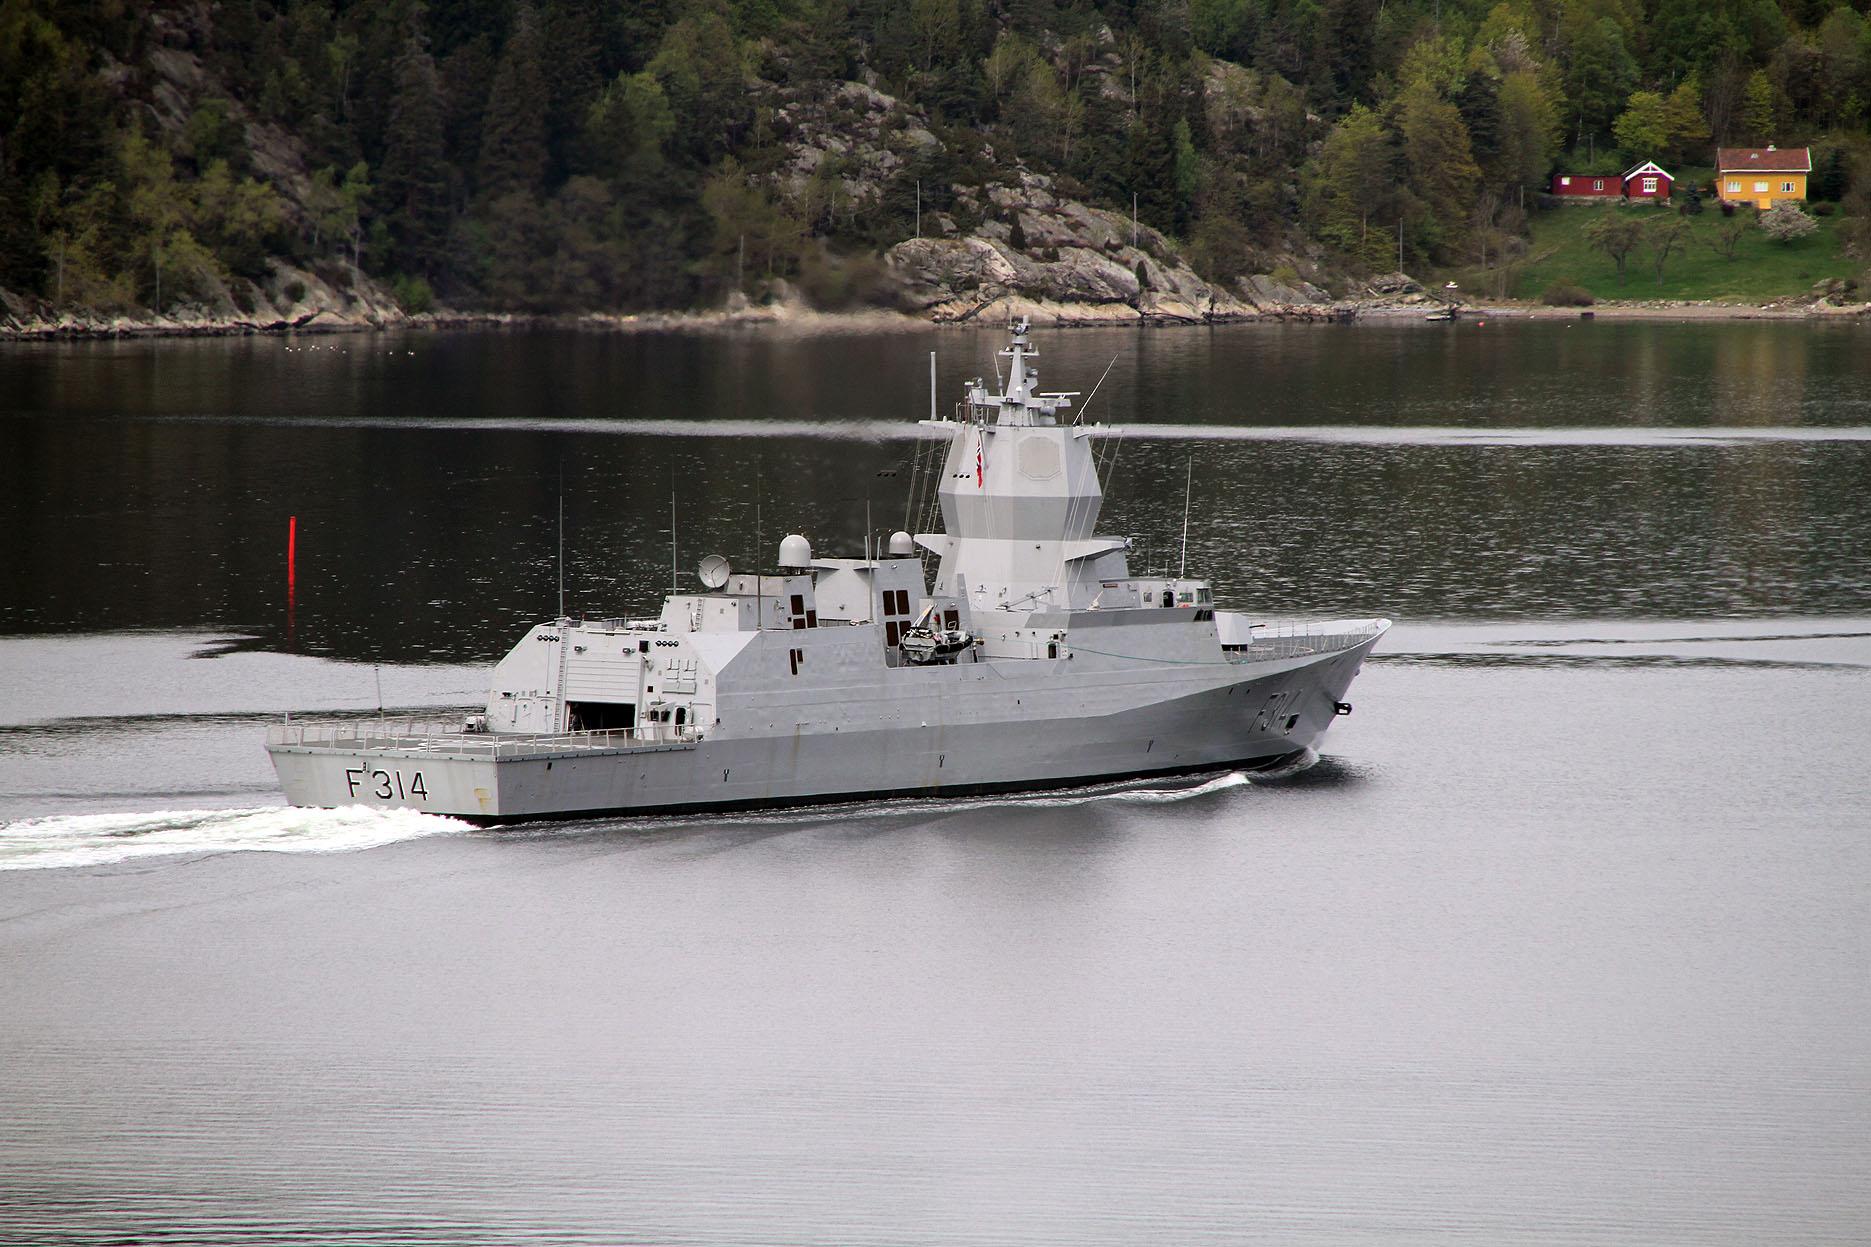 Armée norvegienne/Norwegian Armed Forces - Page 3 1306749